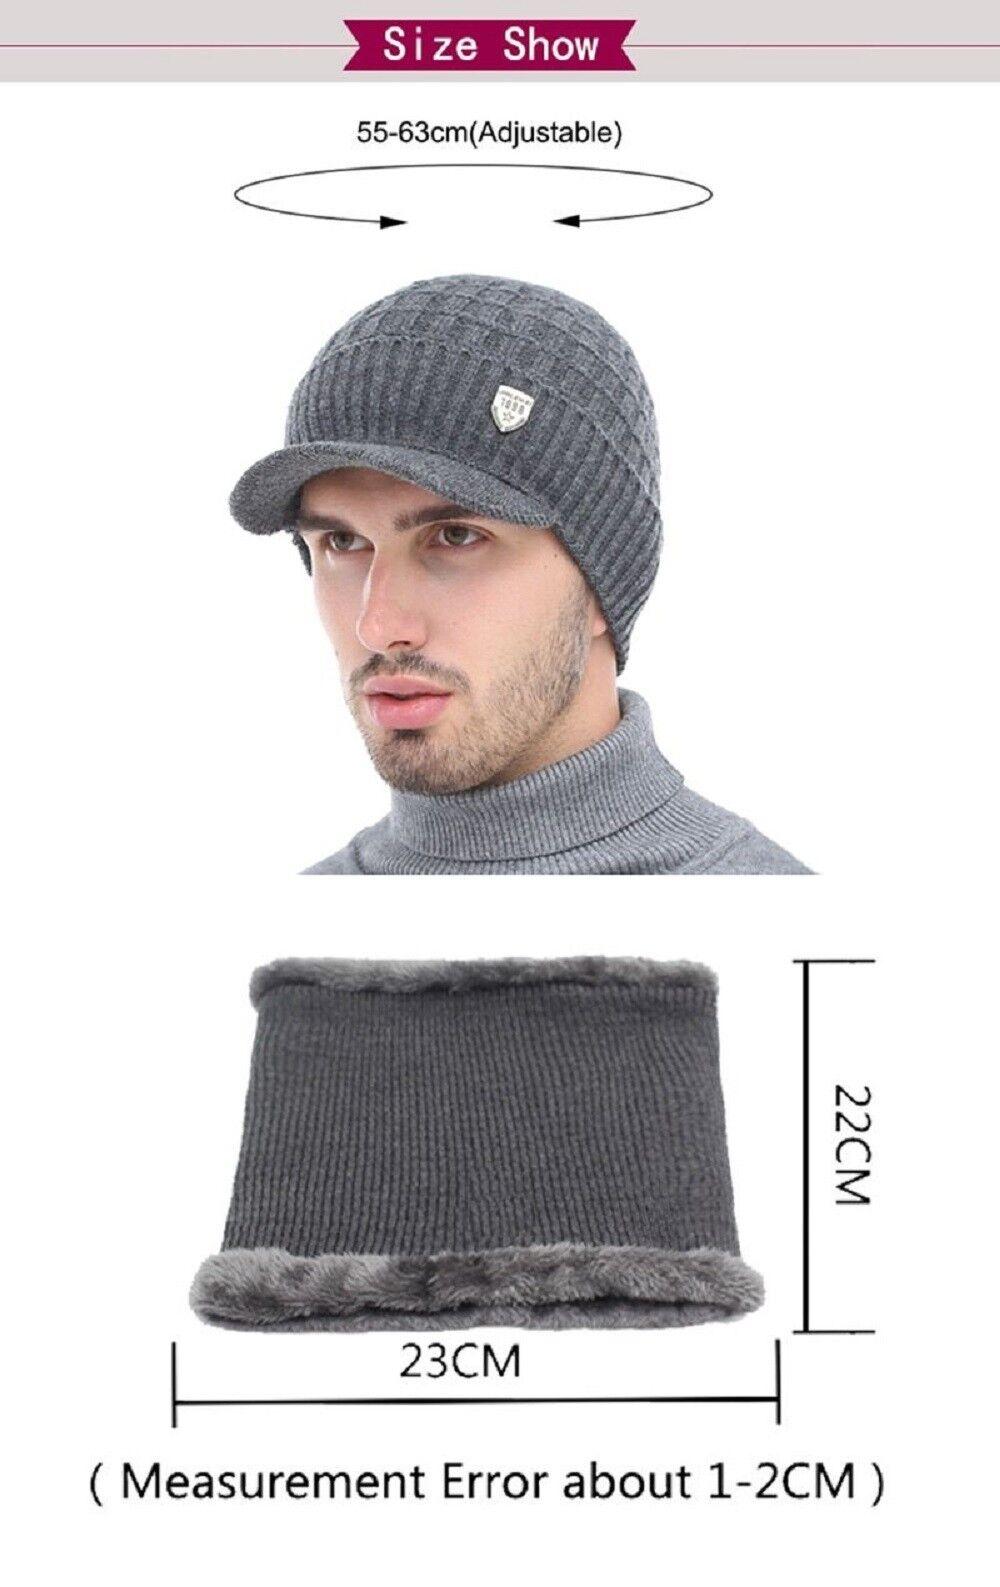 732bfbe64a4 Winter Hat Skullies Beanies Hats Winter Beanies For Men Women Wool Scarf  Caps Balaclava Mask Gorras Bonnet Knitted Hat